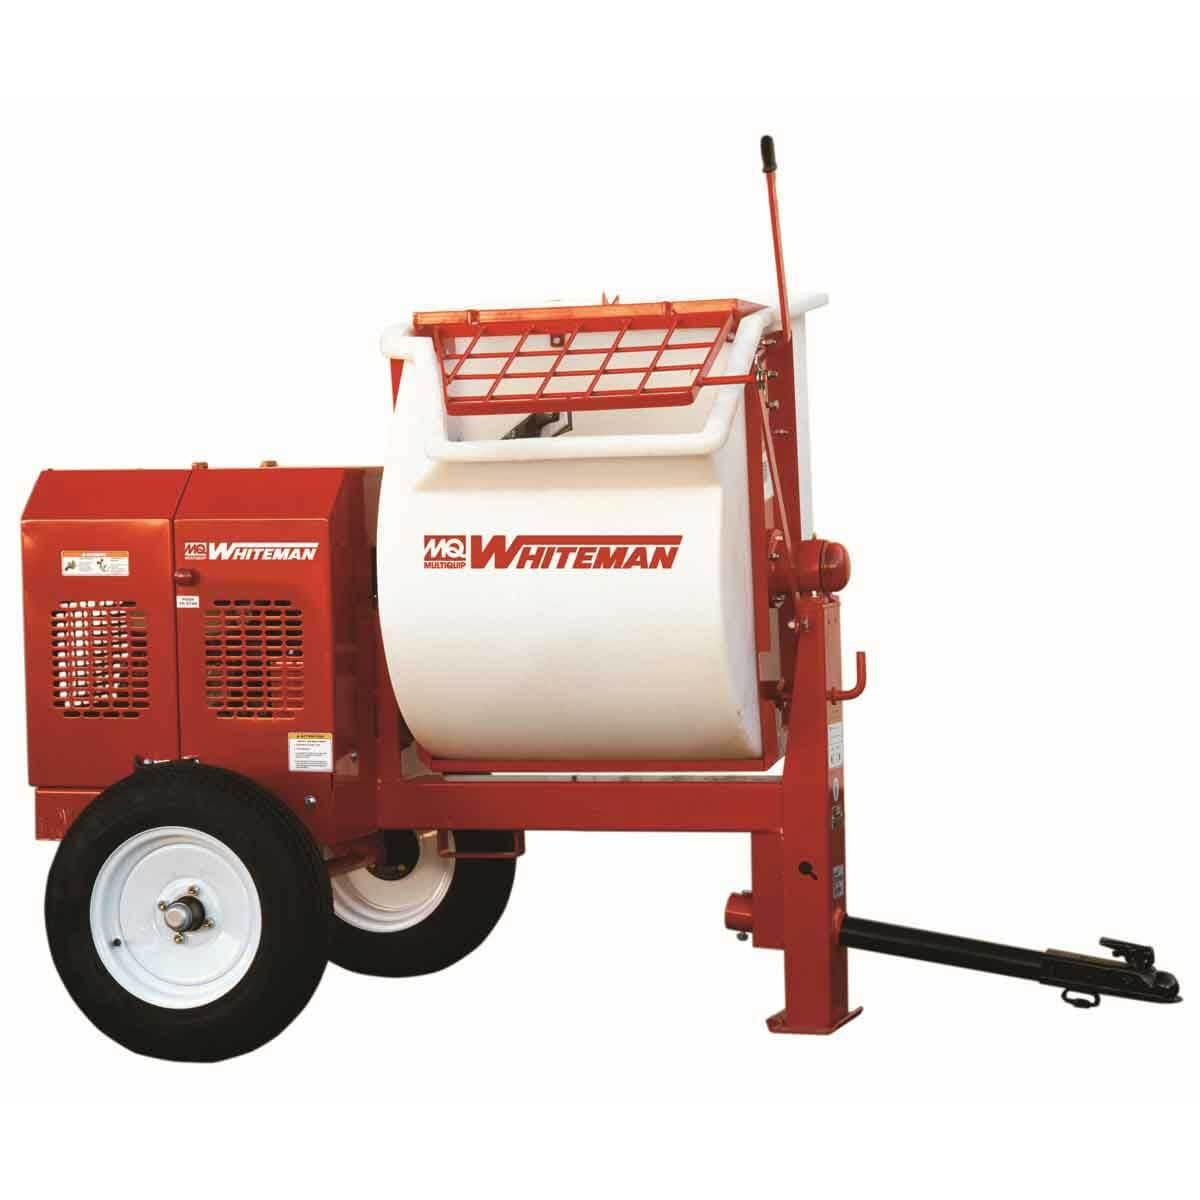 Multiquip Whiteman Mortar Mixer